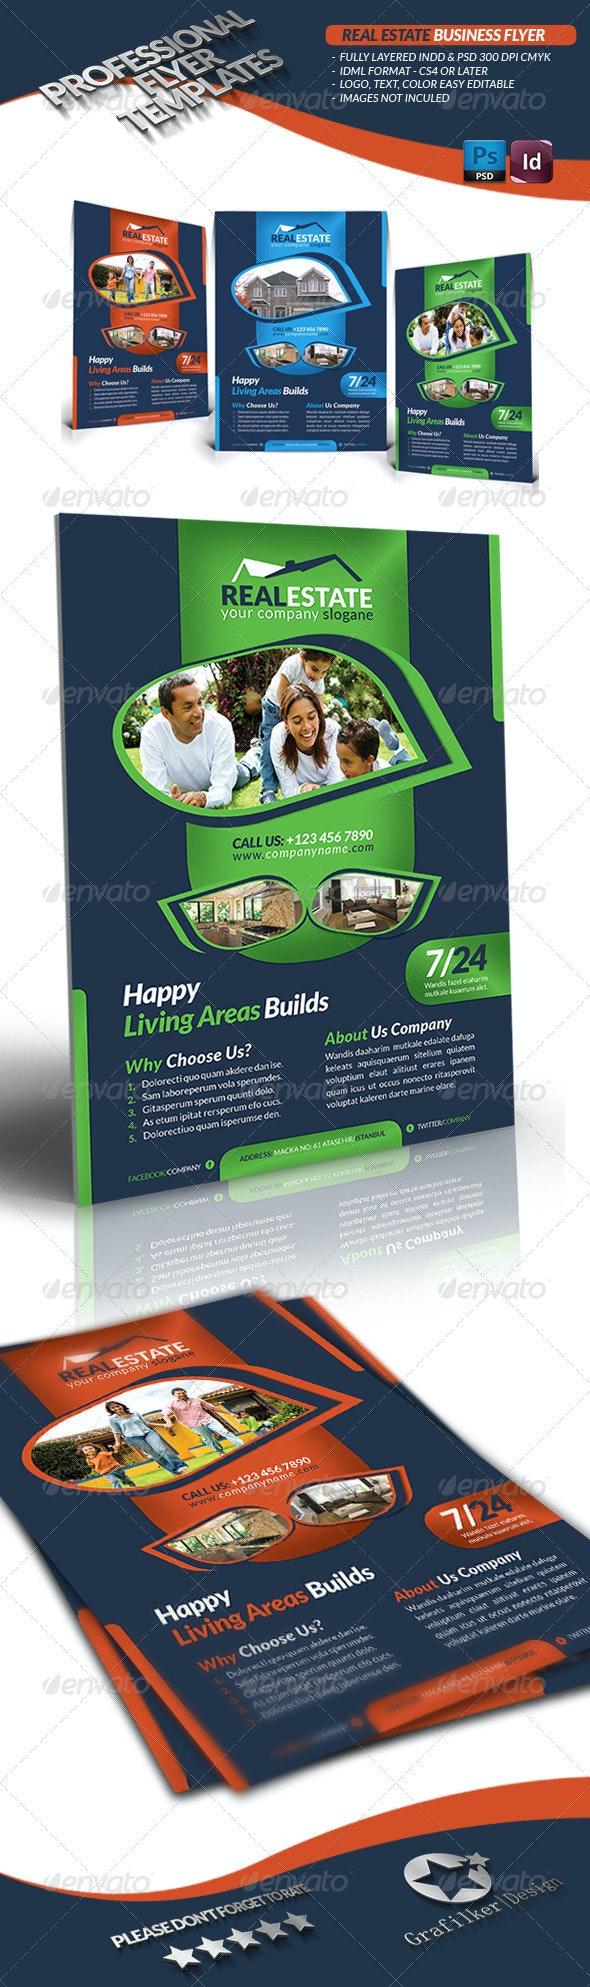 Real Estate Business Flyer  - Commerce Flyers